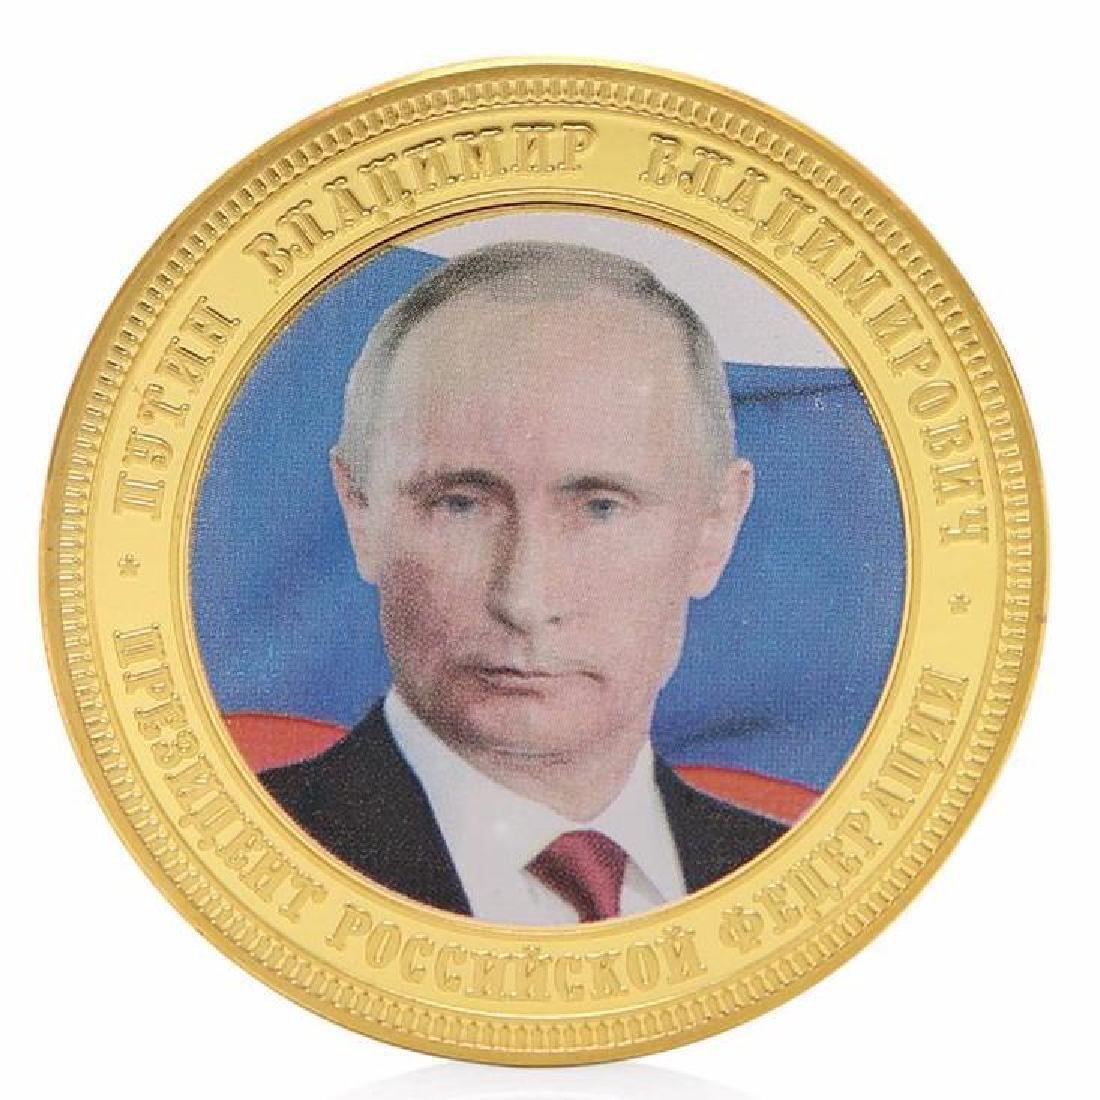 Crimea Russia Vladimir Putin Commemorative Coin